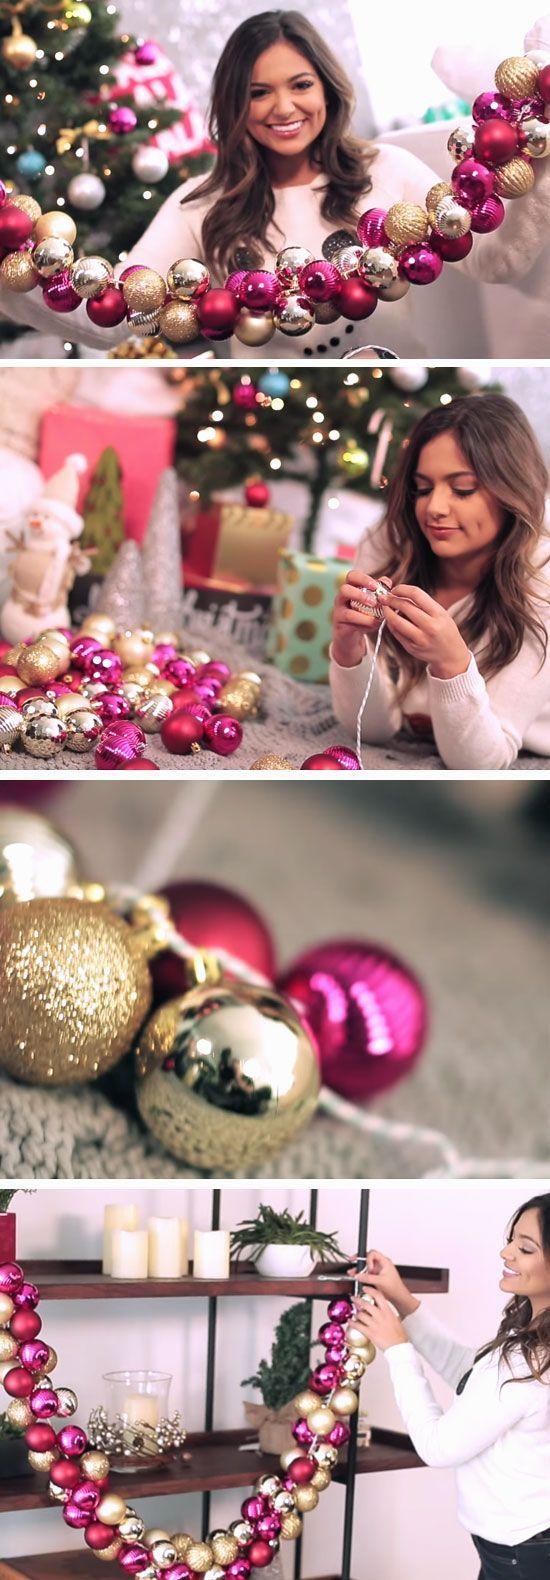 10 Unique & Super Easy Decor Ideas for Christmas